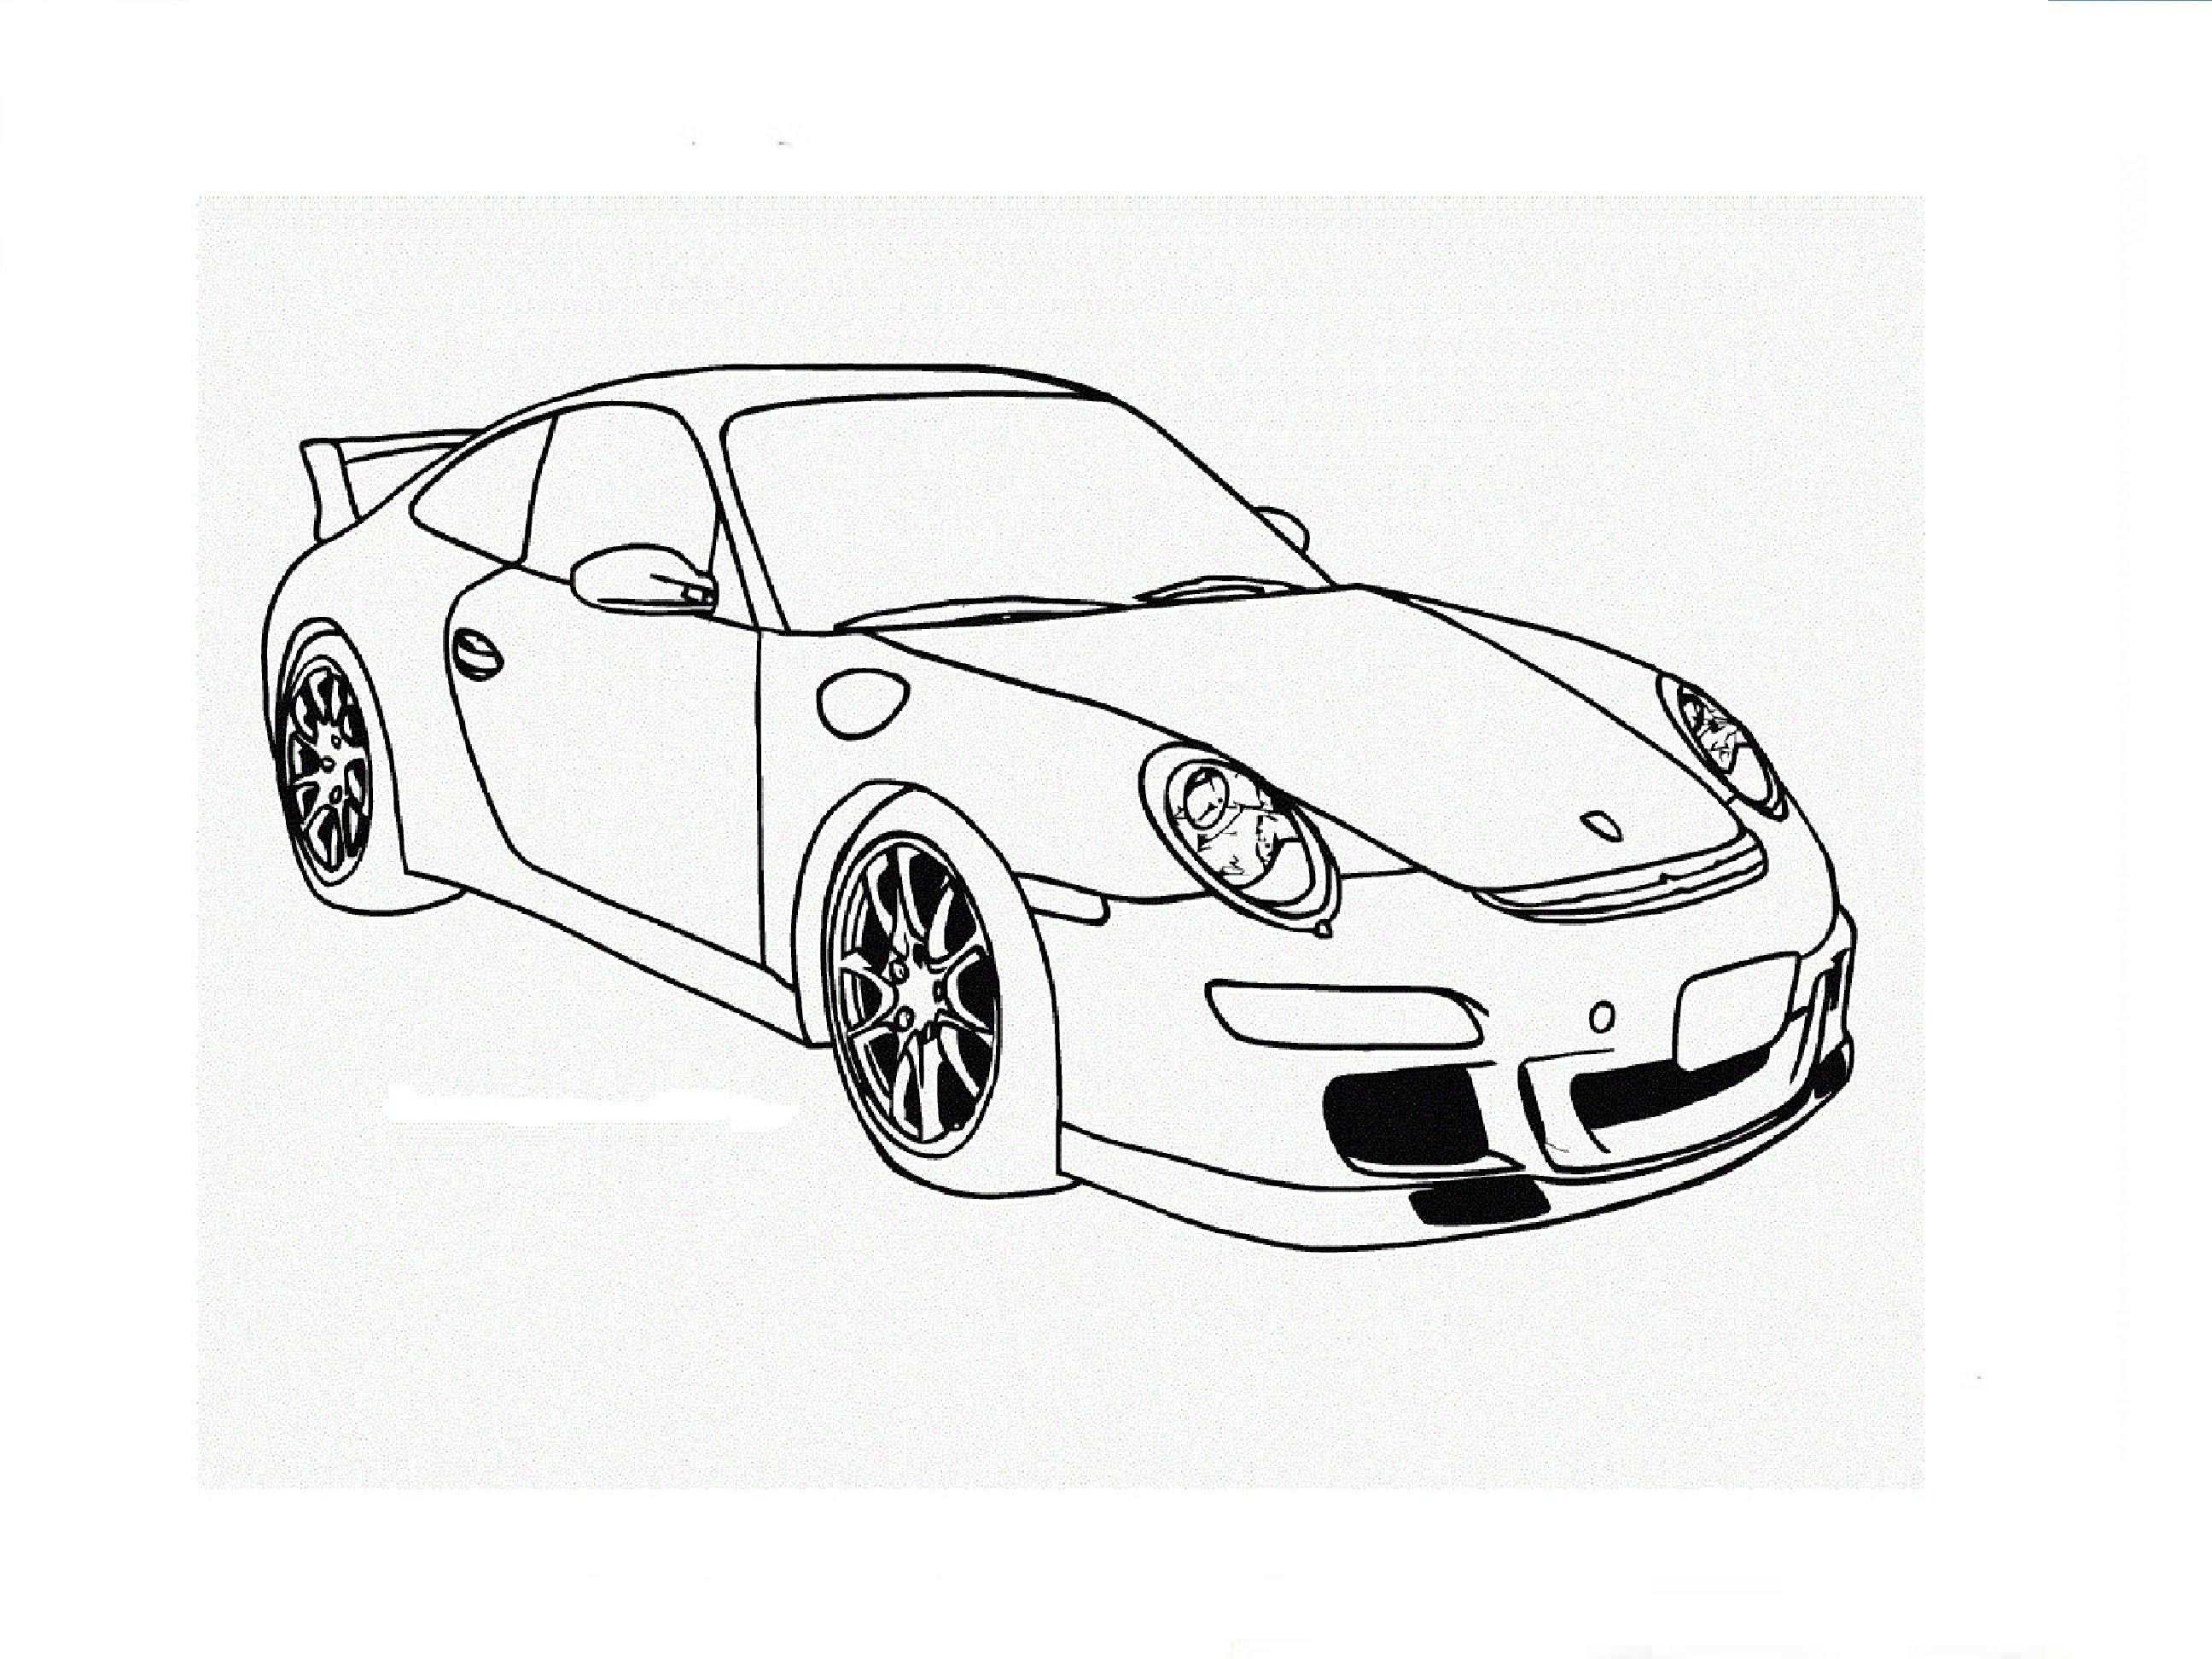 Drawn vehicle porsche 911 Быстрое рисование Porsche Speed 911